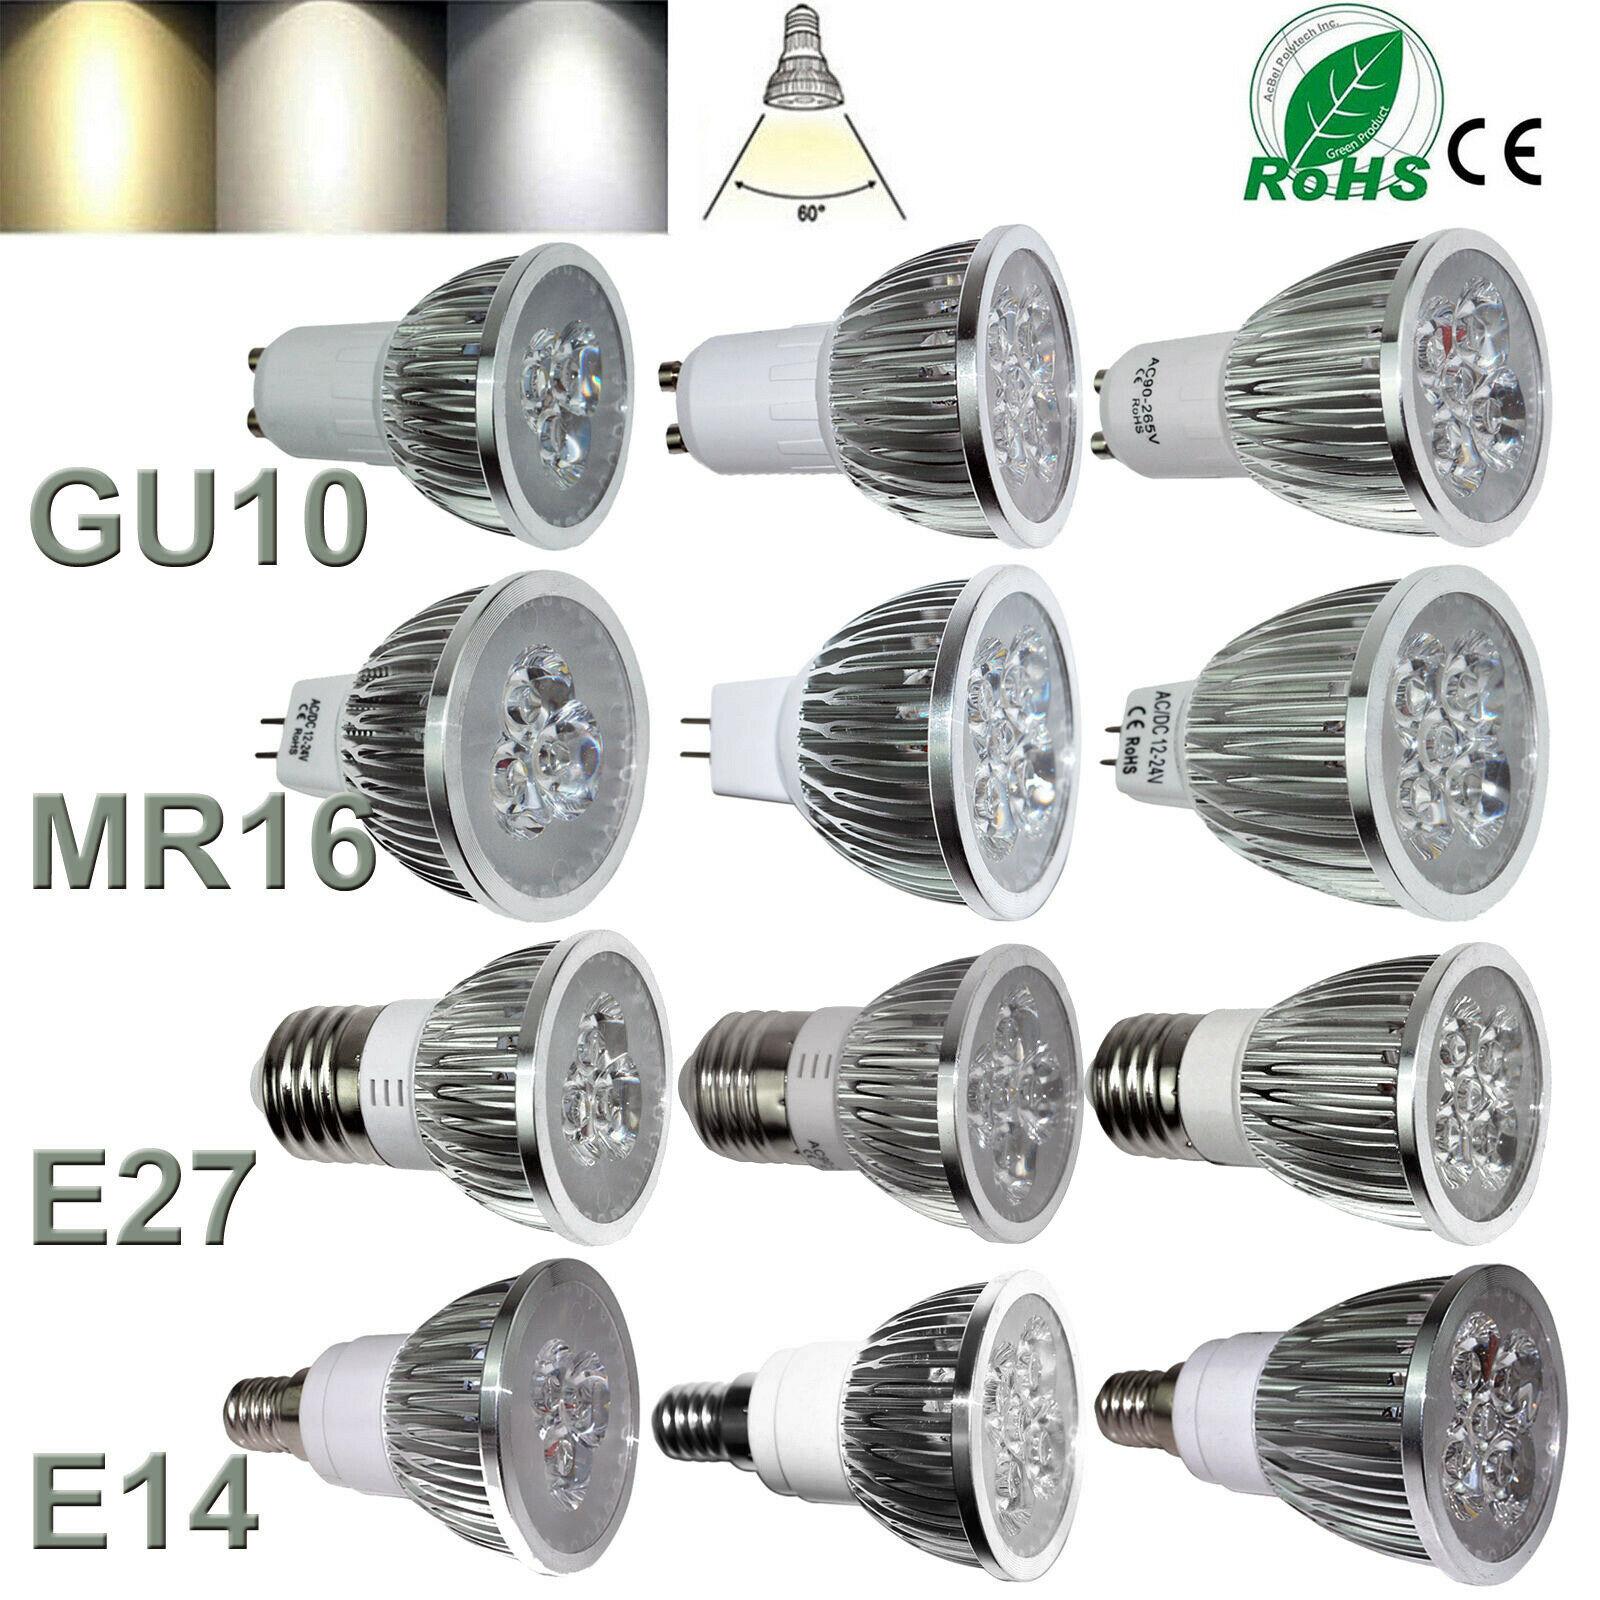 10x GU10 MR16 E27 5W 7W 9W LED Bulbs Spotlight SMD Lamps Day//Warm White Light